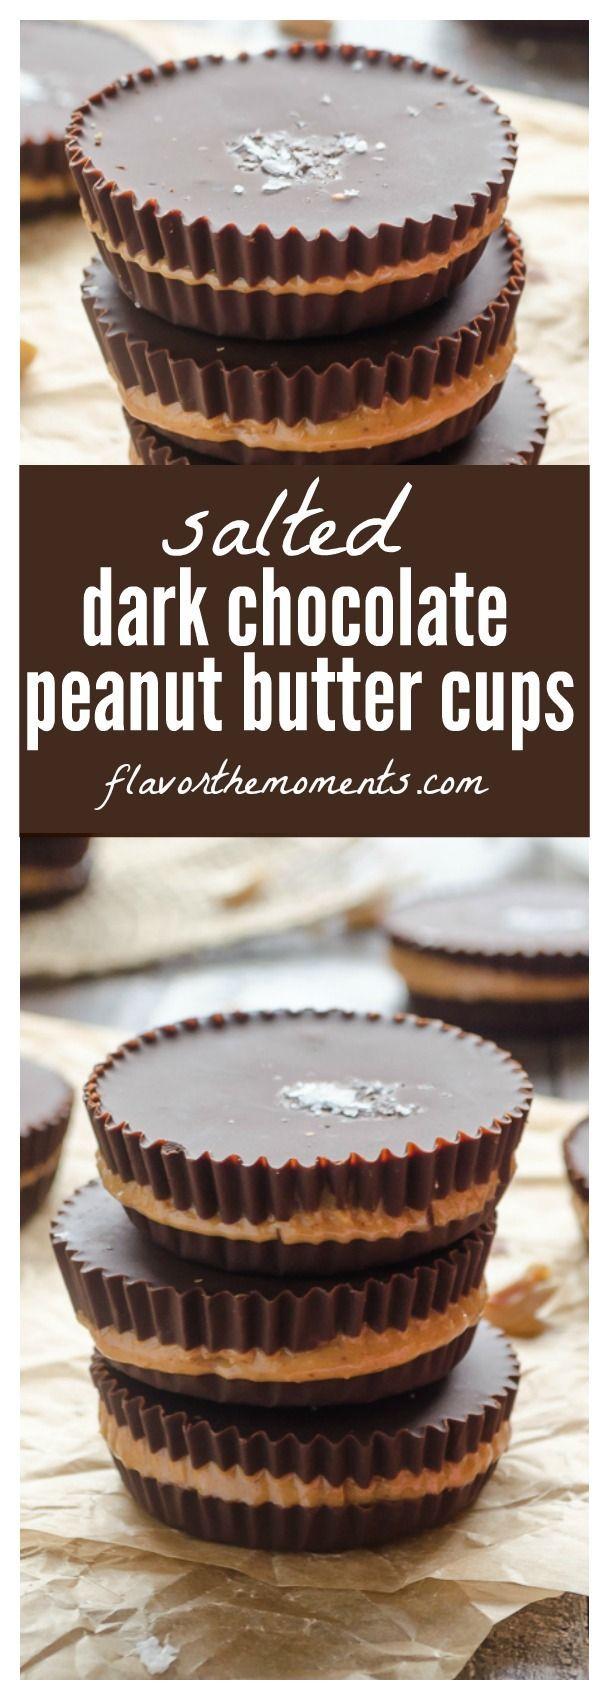 Salted Dark Chocolate Peanut Butter Cups   Recipe